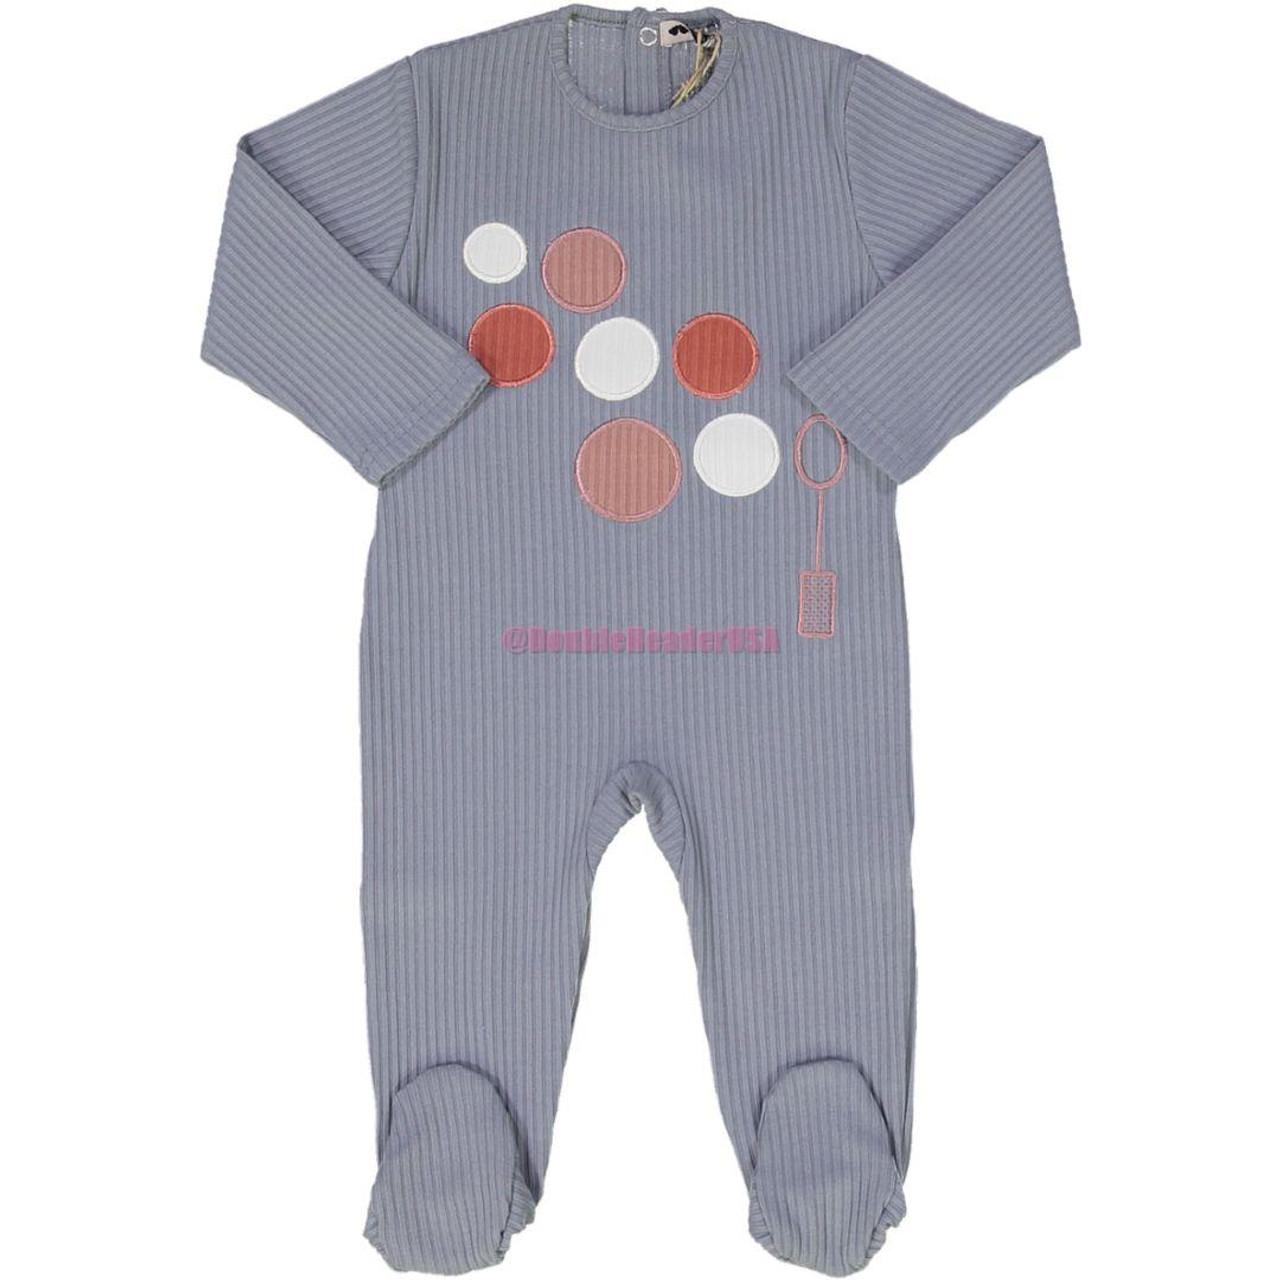 Teddy Bear Baby Boys Cotton Stretchie - R1BBB